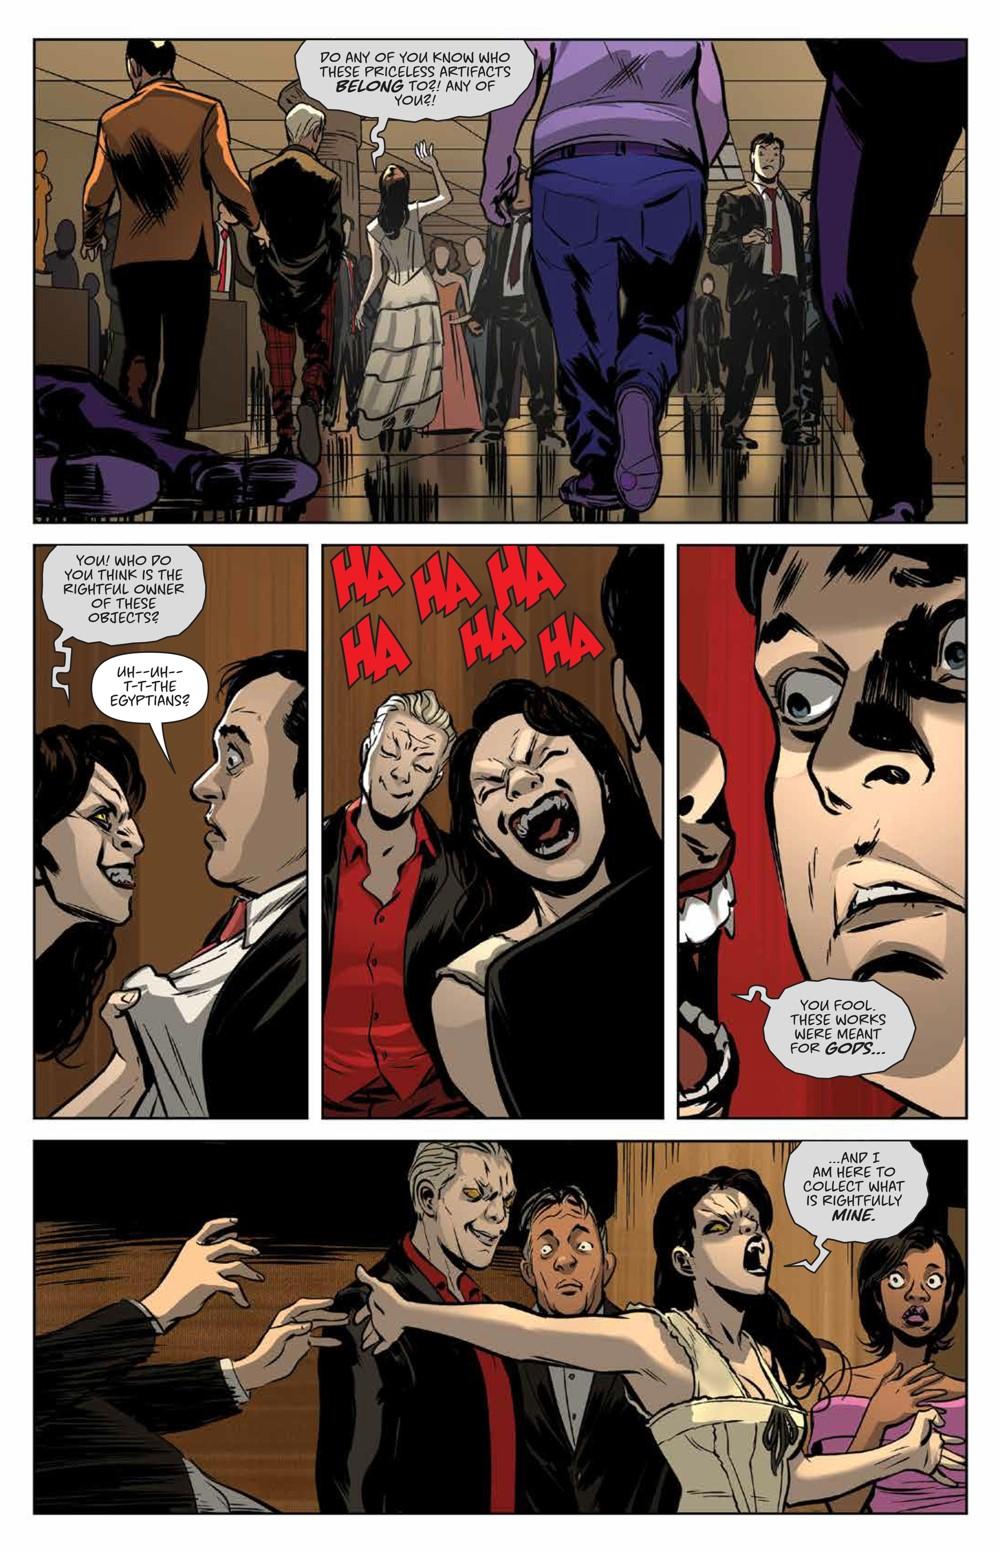 Buffy_Deluxe_v2_Hellmouth_HC_PRESS_21 ComicList Previews: BUFFY THE VAMPIRE SLAYER HELLMOUTH DELUXE EDITION HC